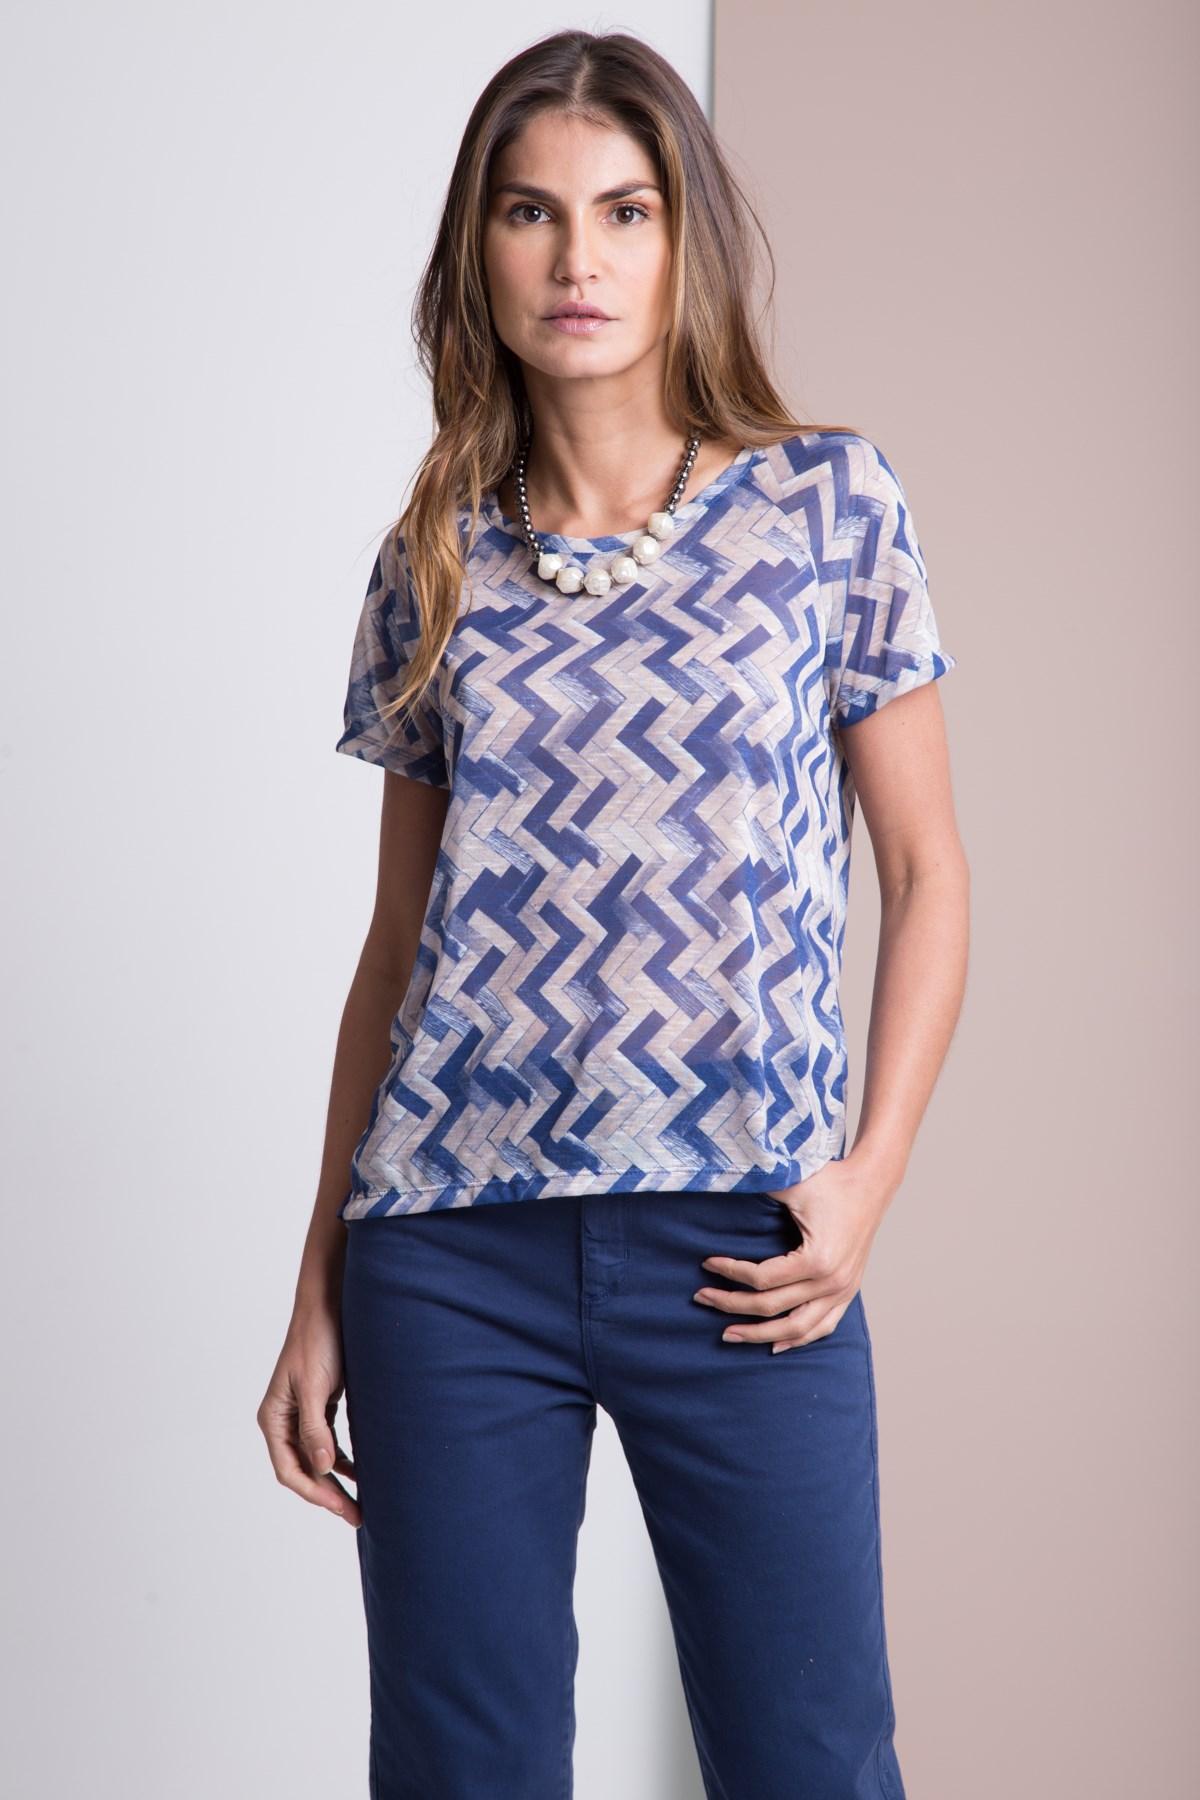 Blusa Decote Aplicado Malha Zig Zag